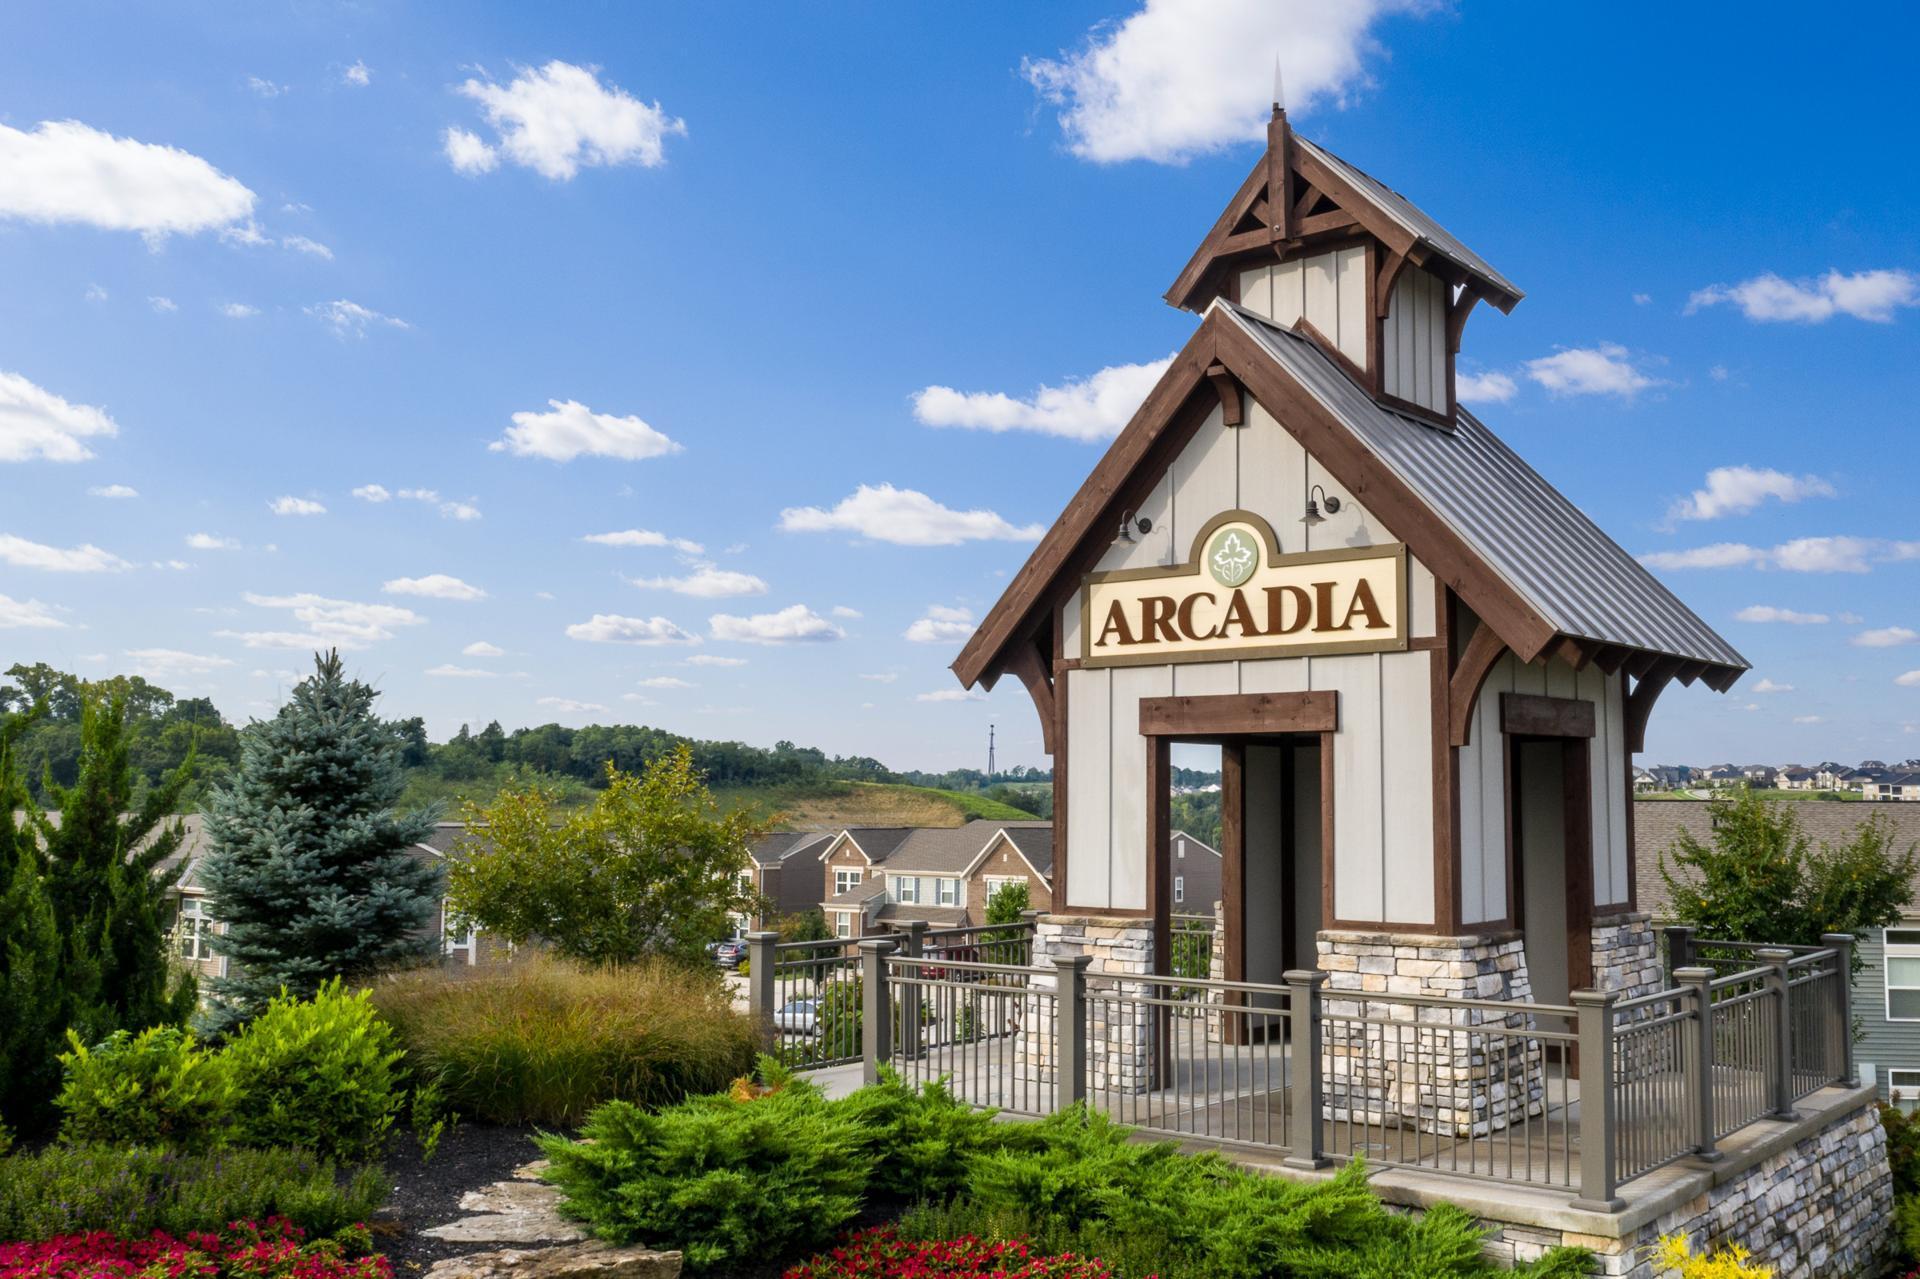 The Arcadia entrance